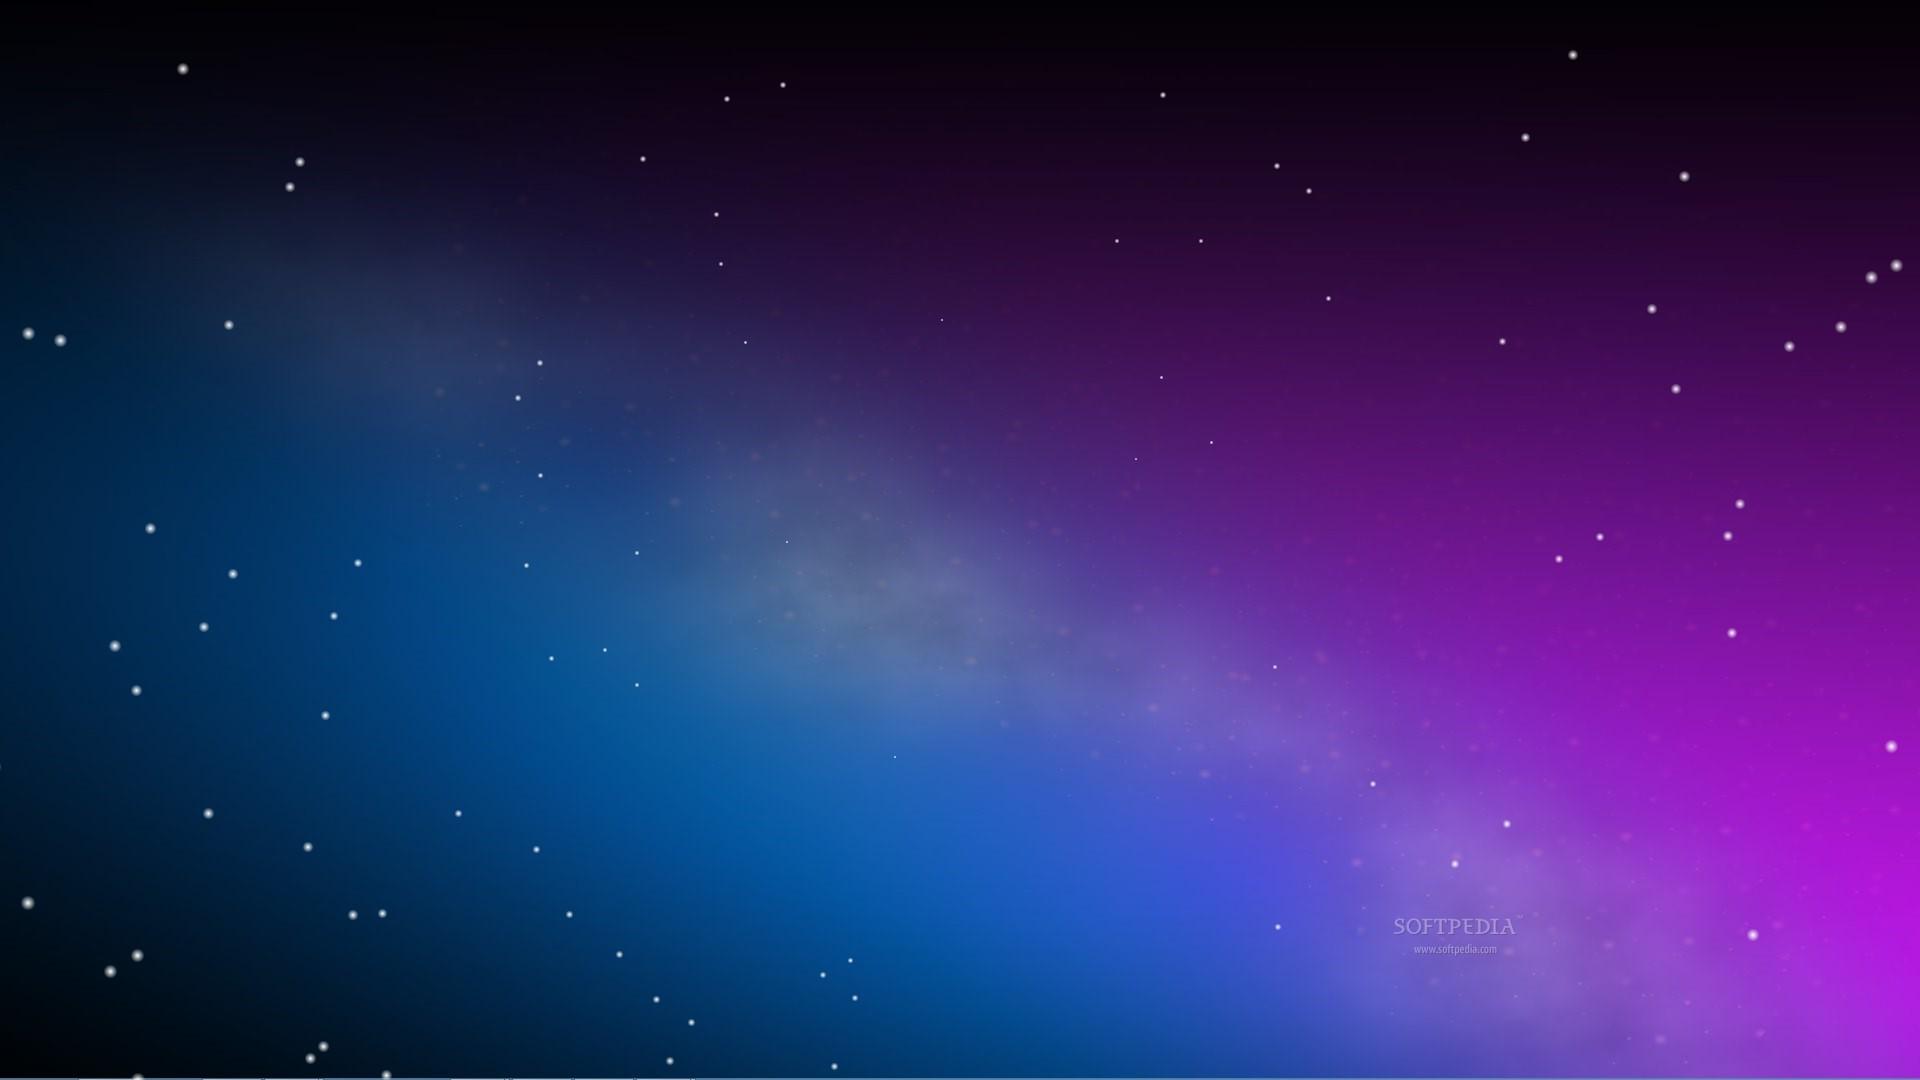 infinity galaxy background